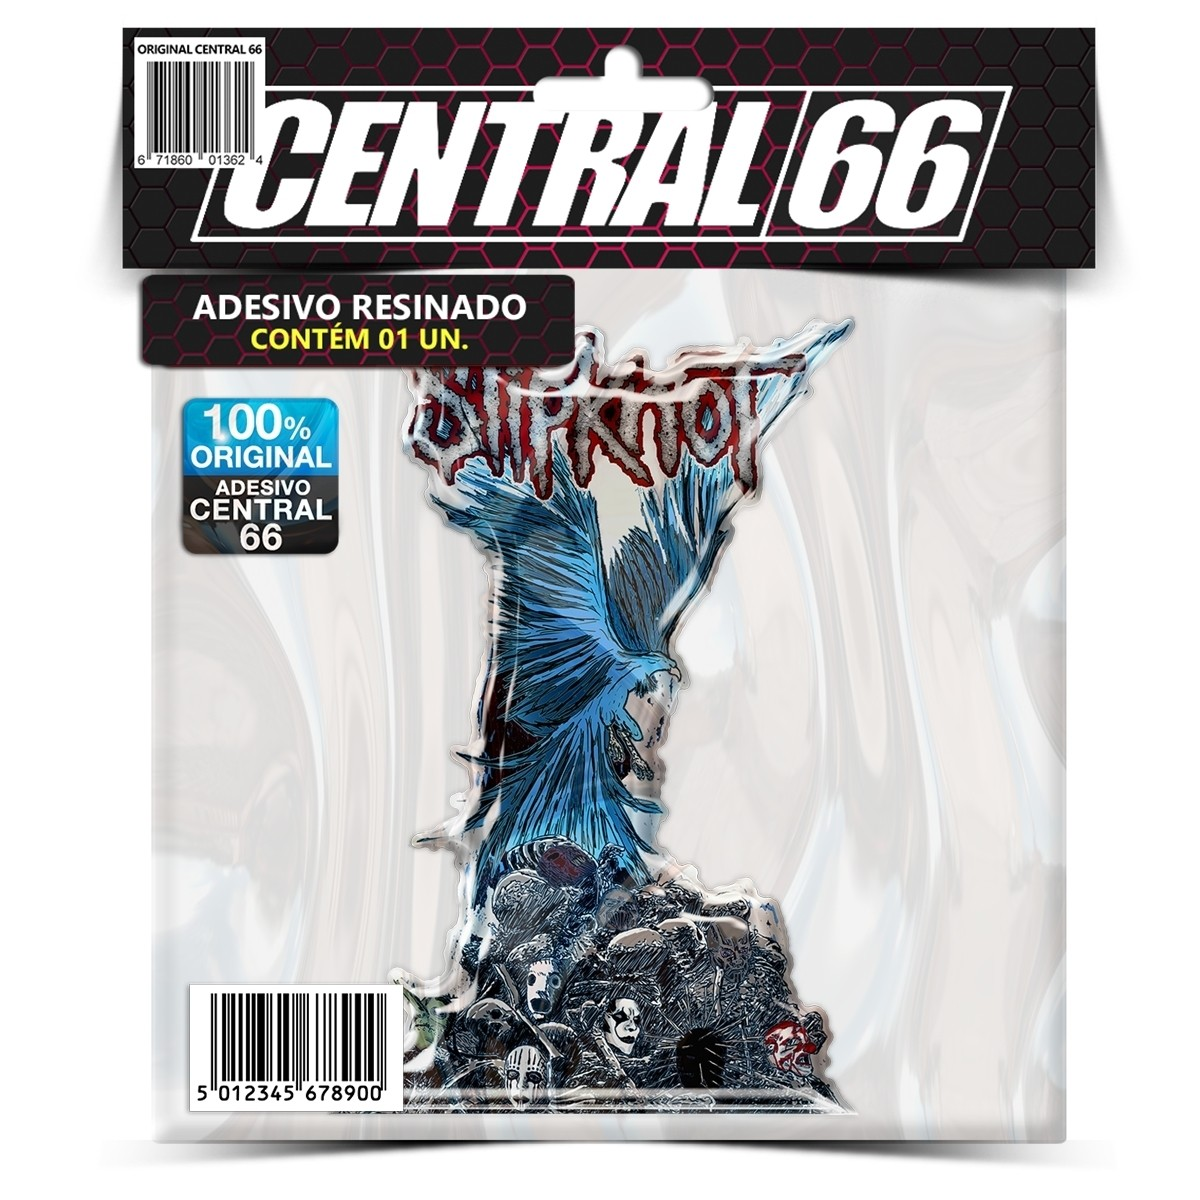 Adesivo Slipknot M02 – Central 66